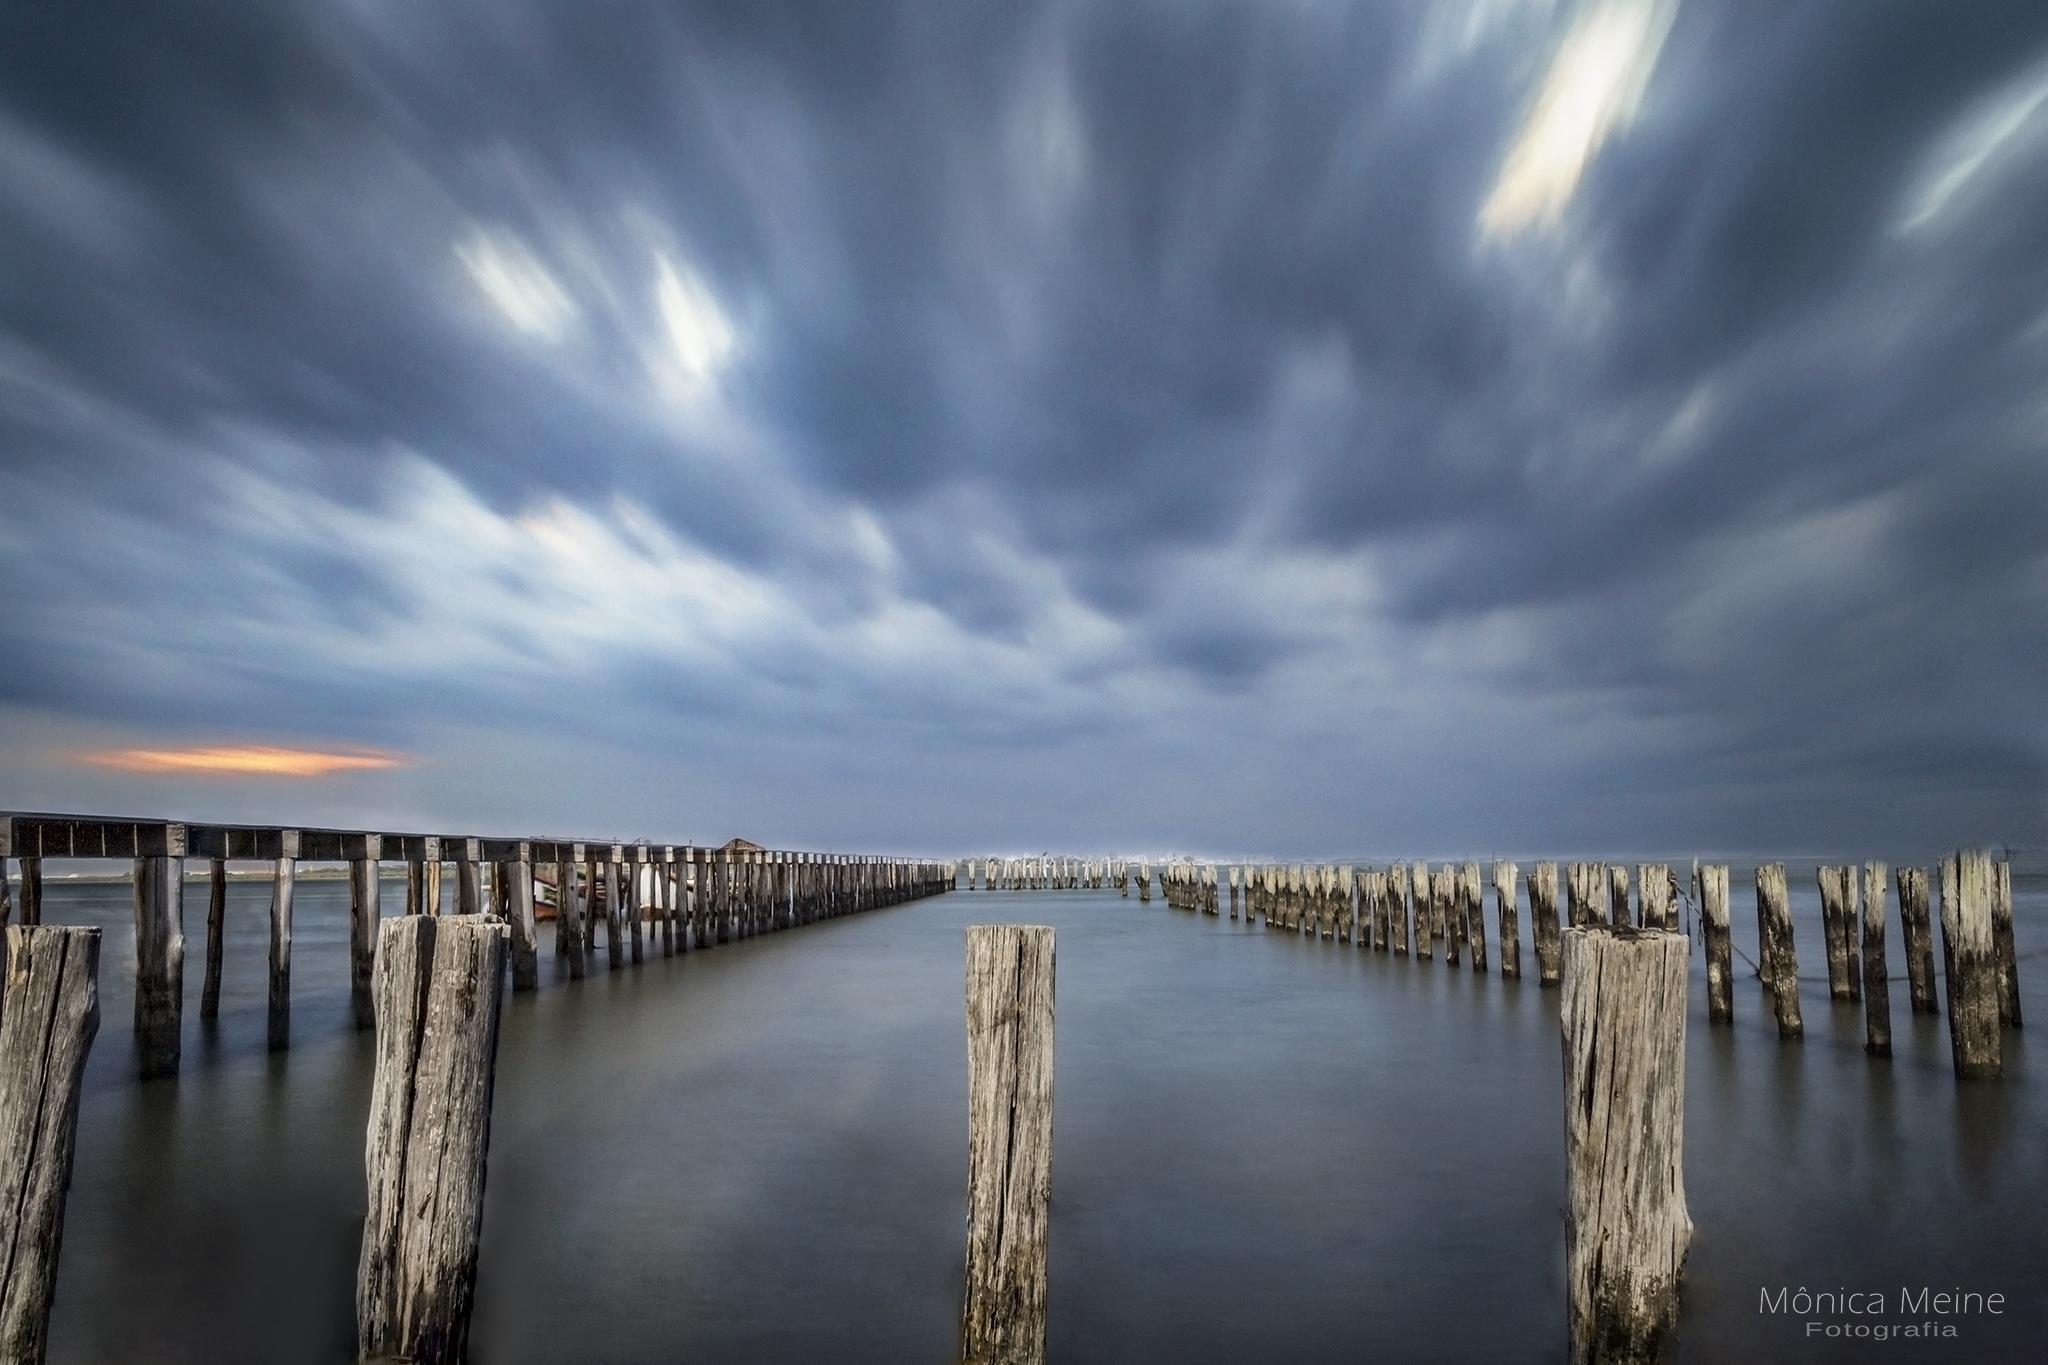 Pier, Brazil